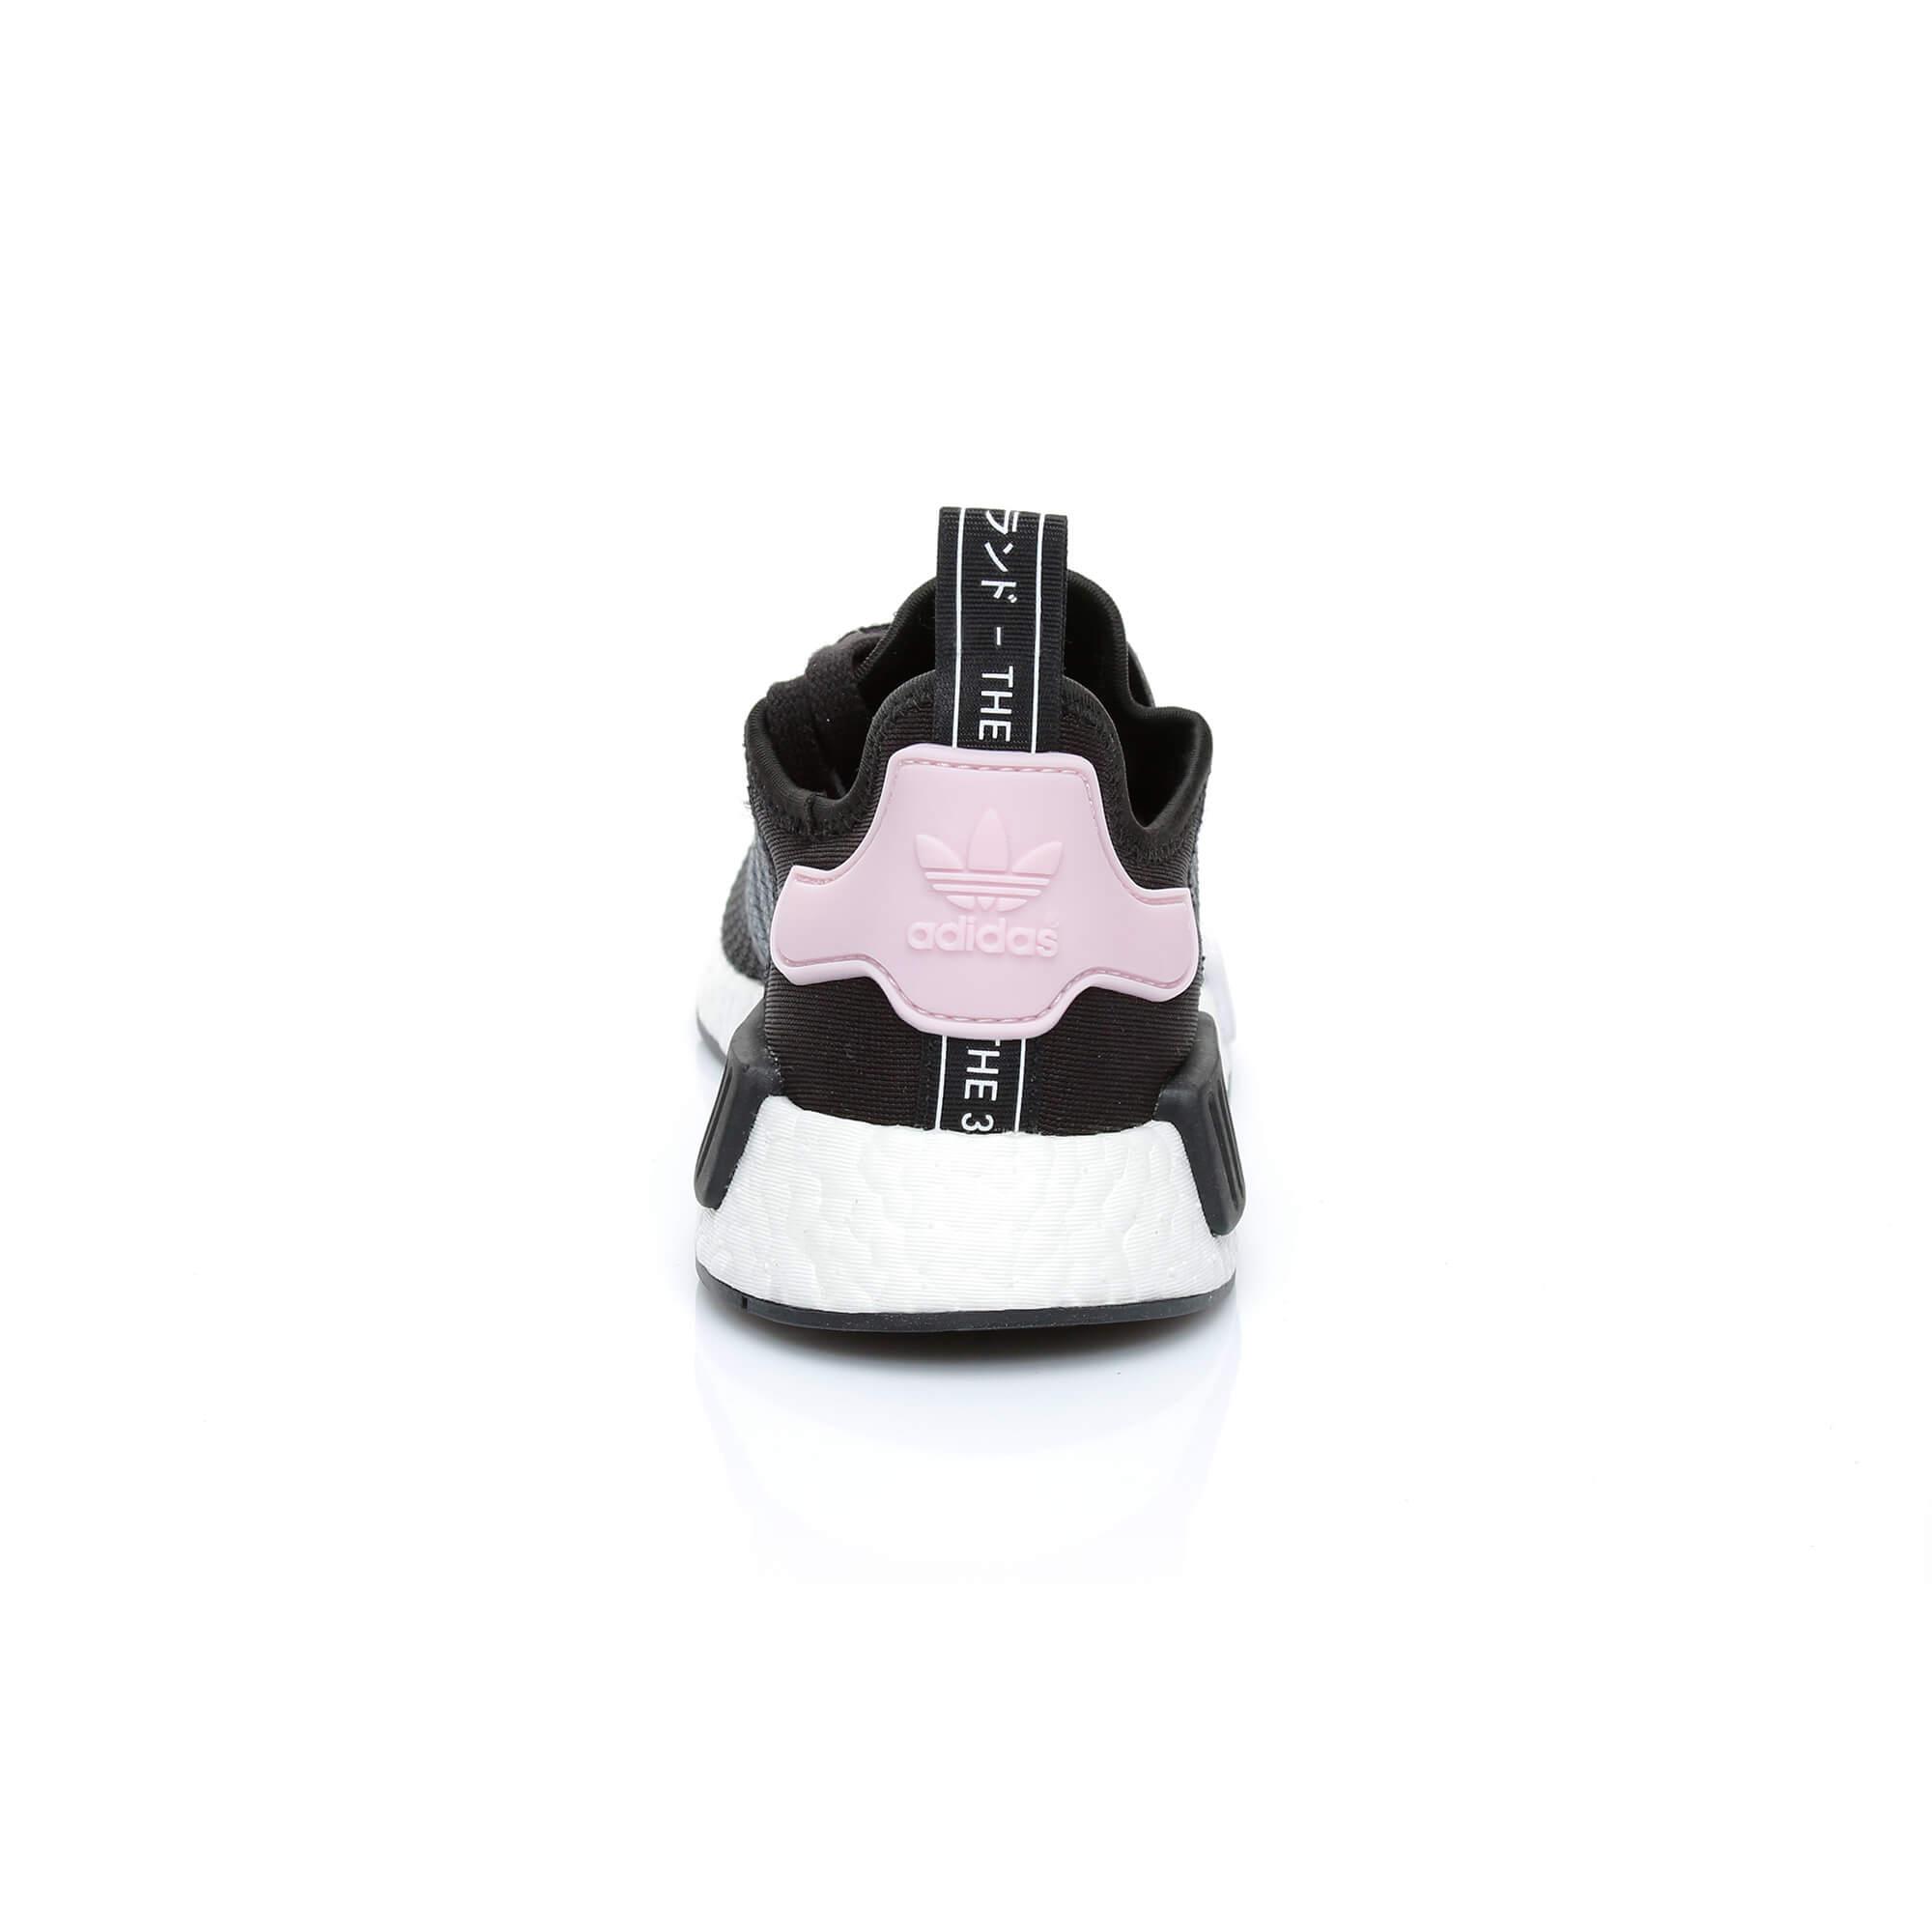 adidas NMD Kadın Siyah Spor Ayakkabı